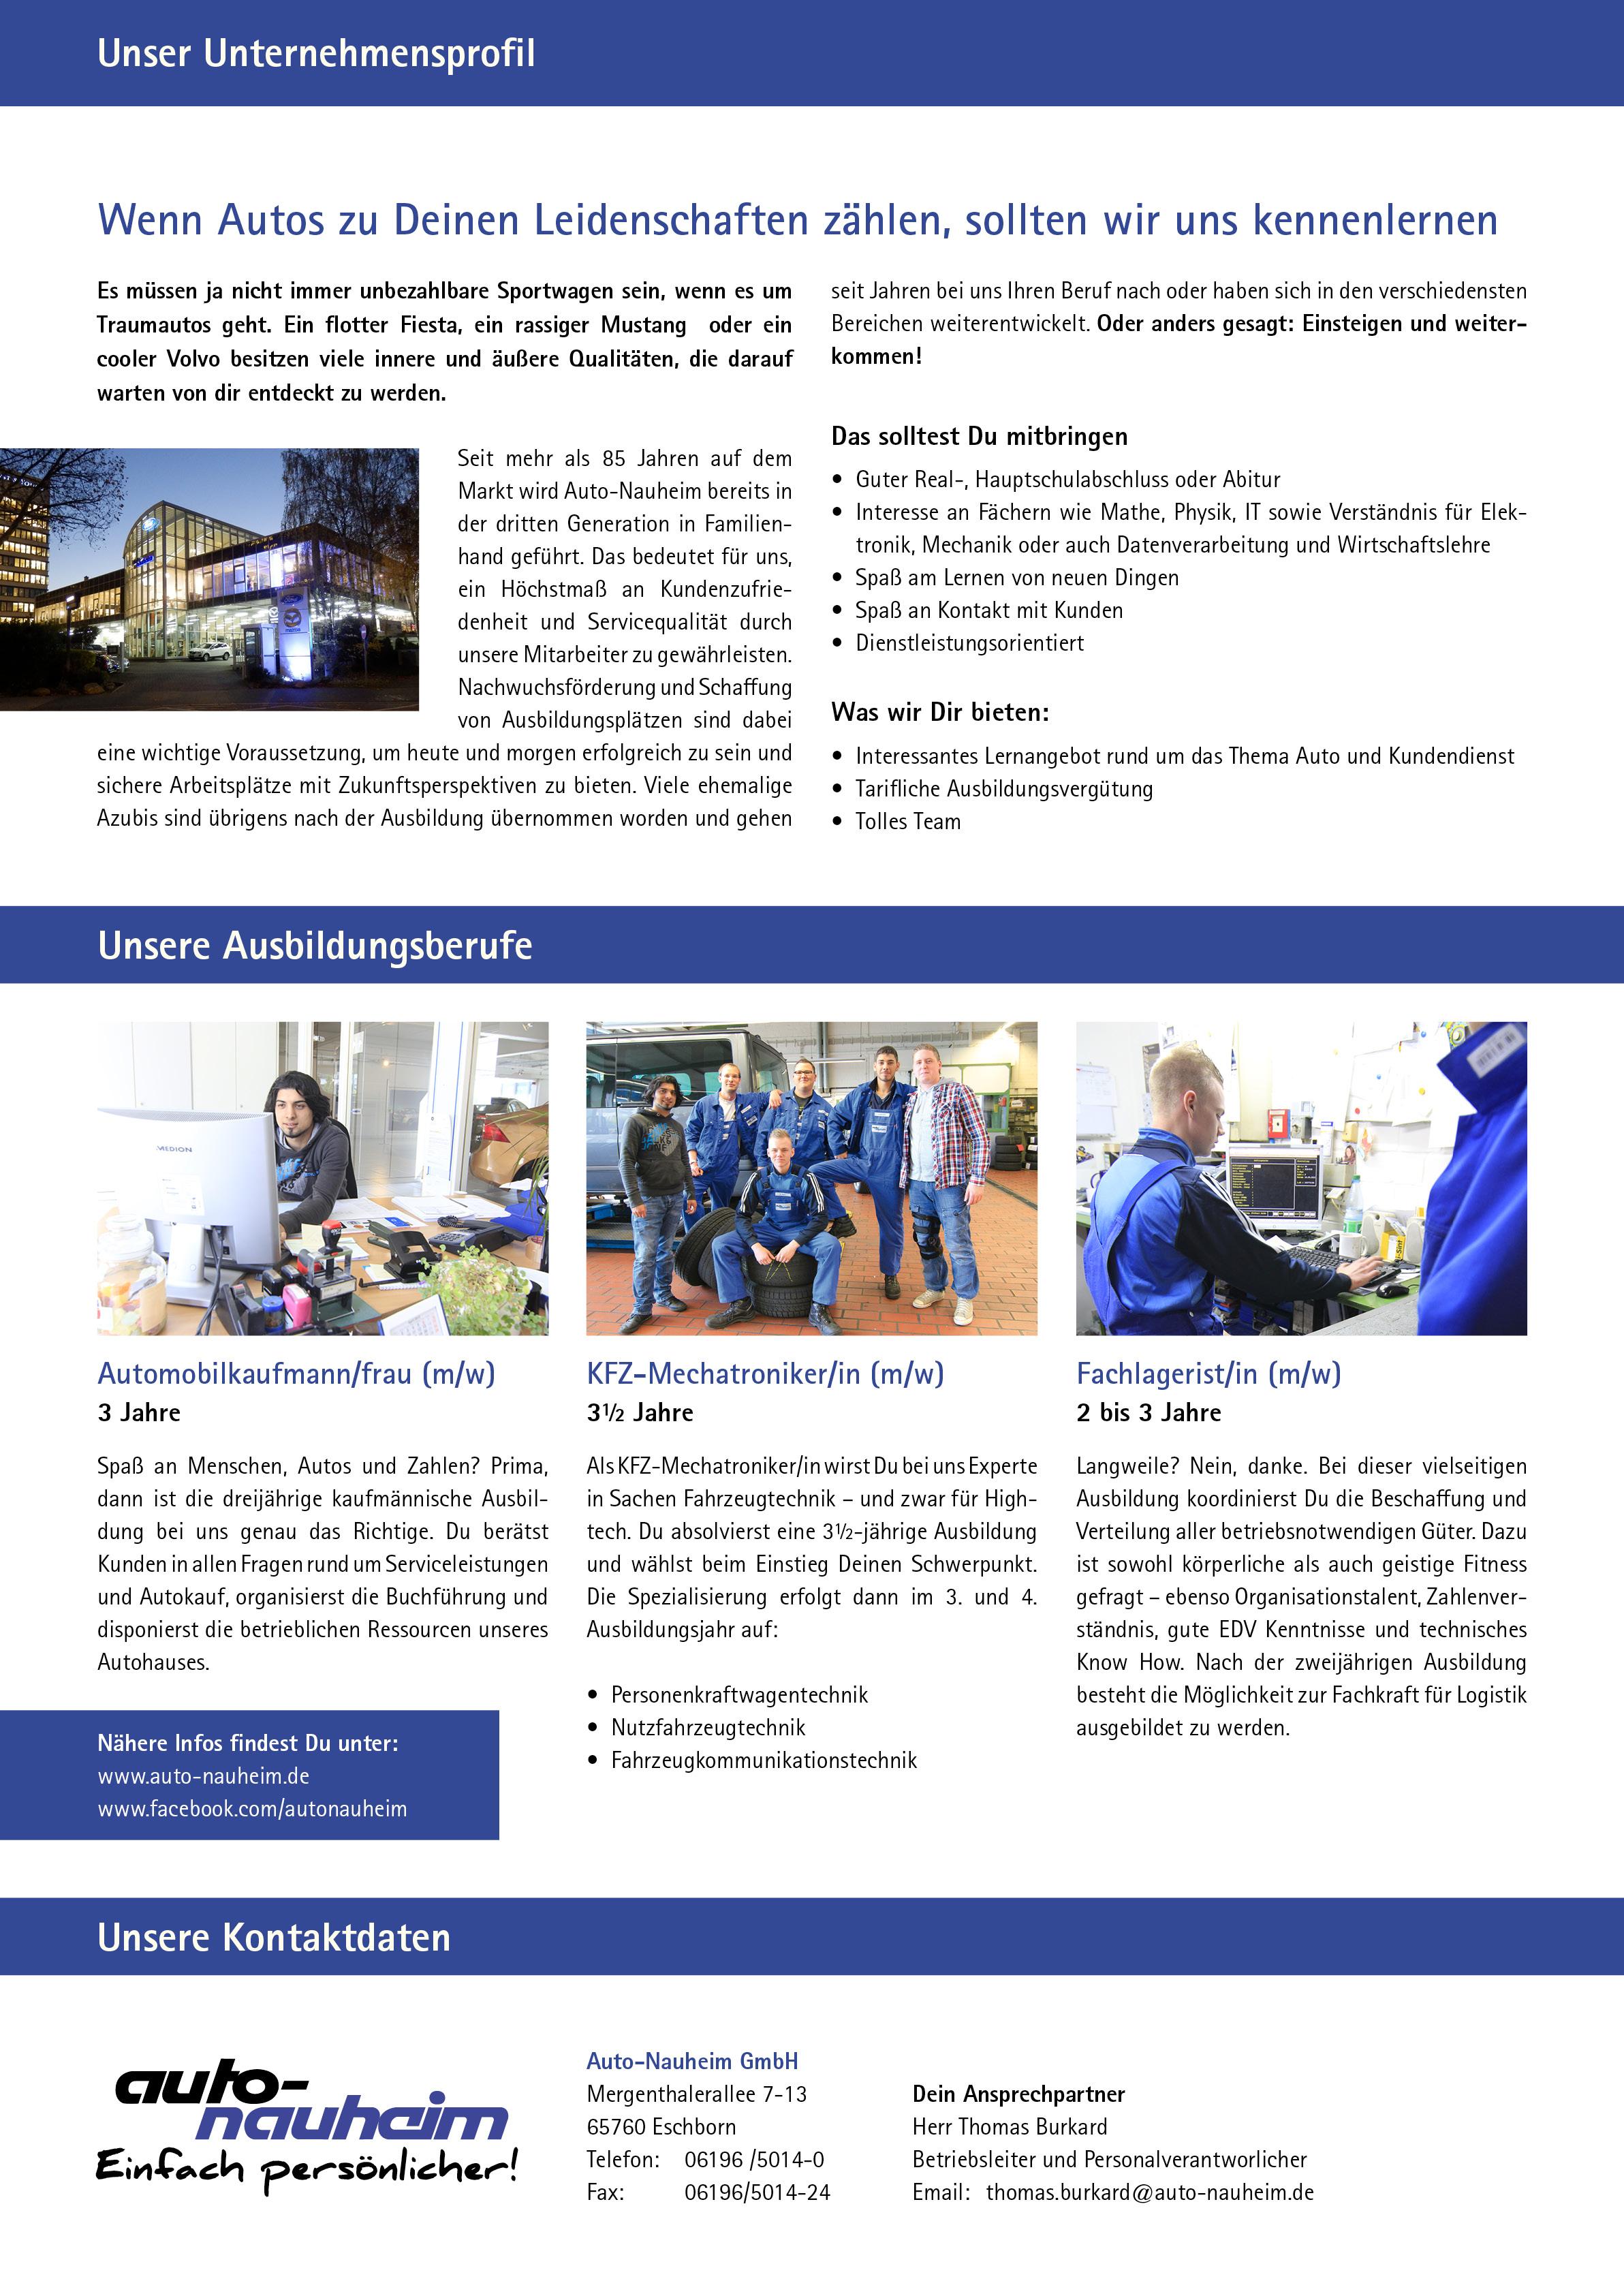 Ausbildungsplakat: Auto-Nauheim GmbH